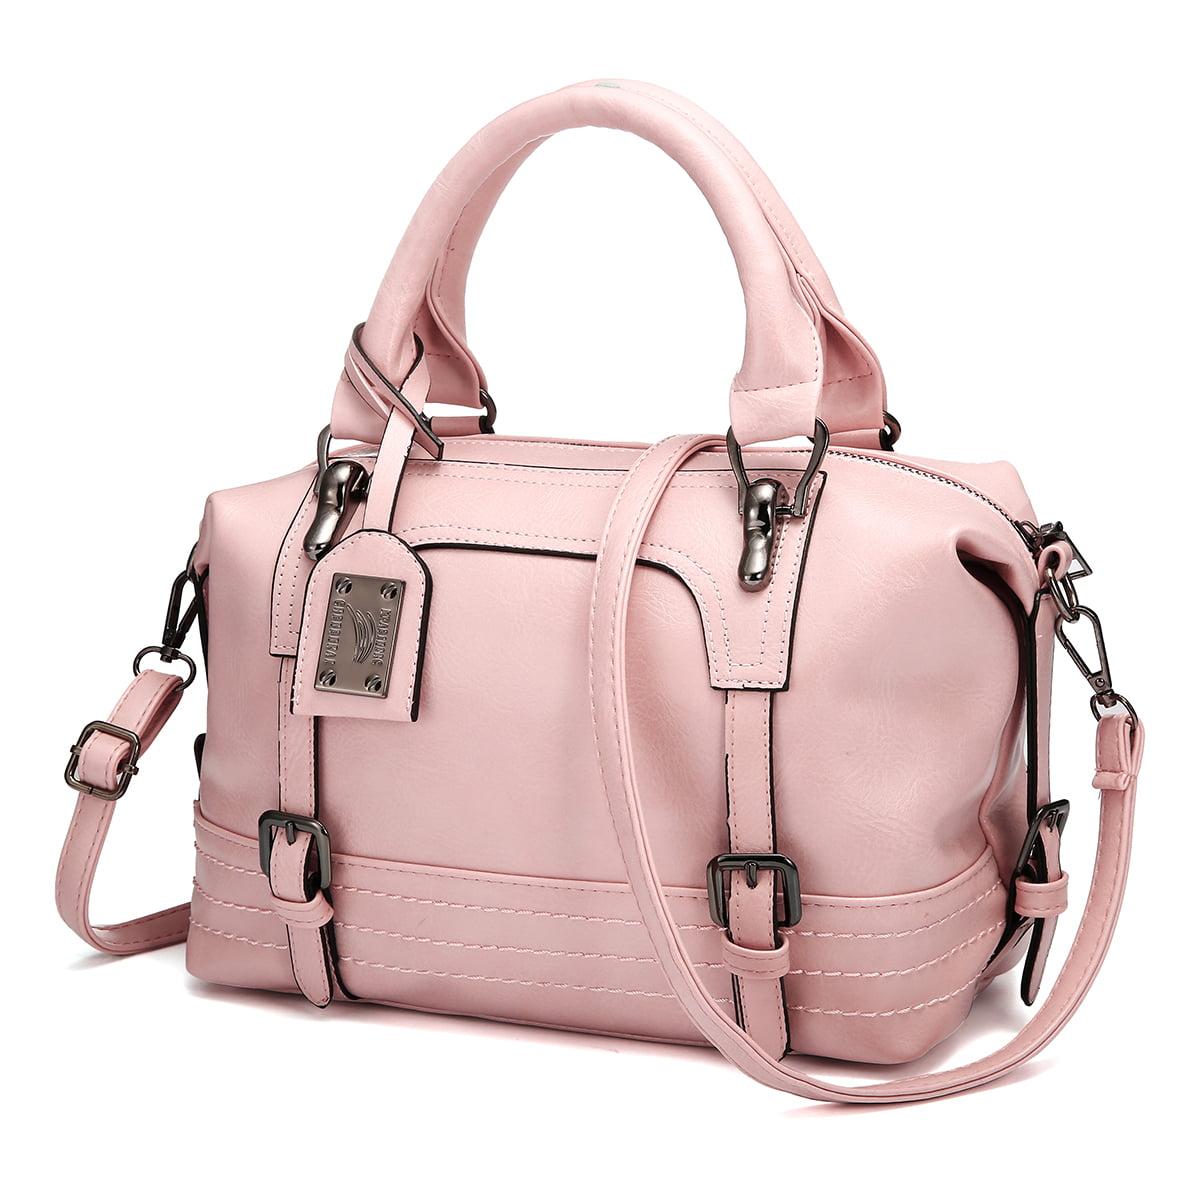 Womens Shoulder Handbag Totes Messenger Crossbody Bag For Lady Mums Gifts